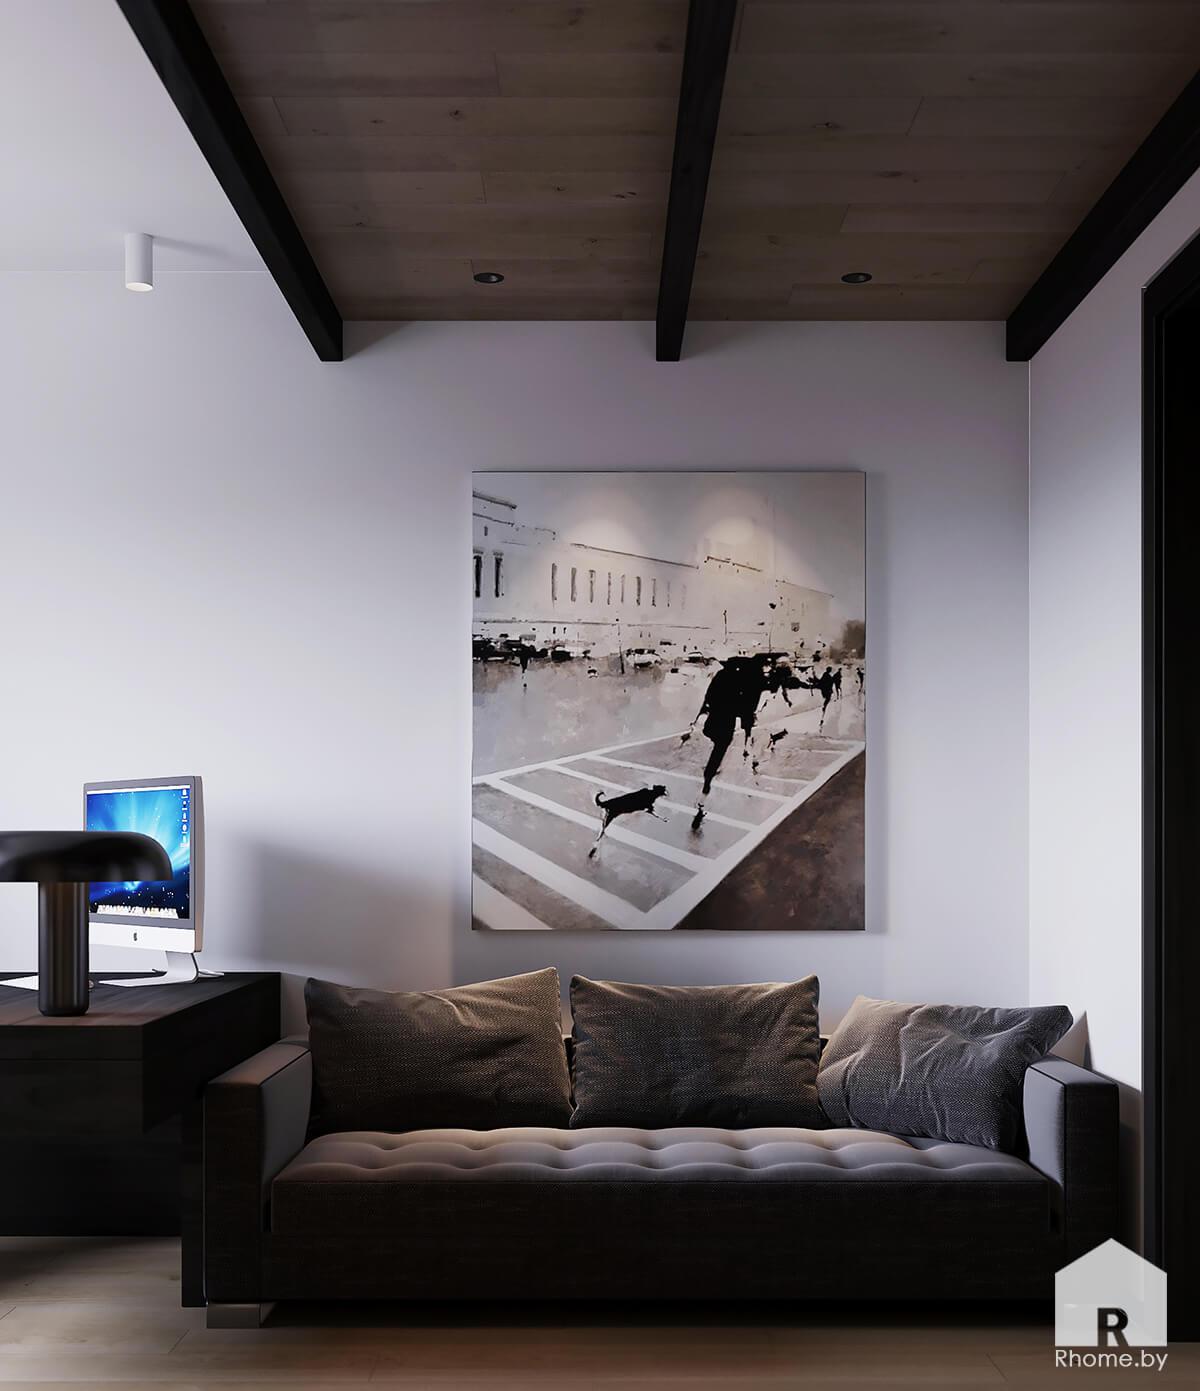 Дизайн кабинета | Дизайн студия – Rhome.by